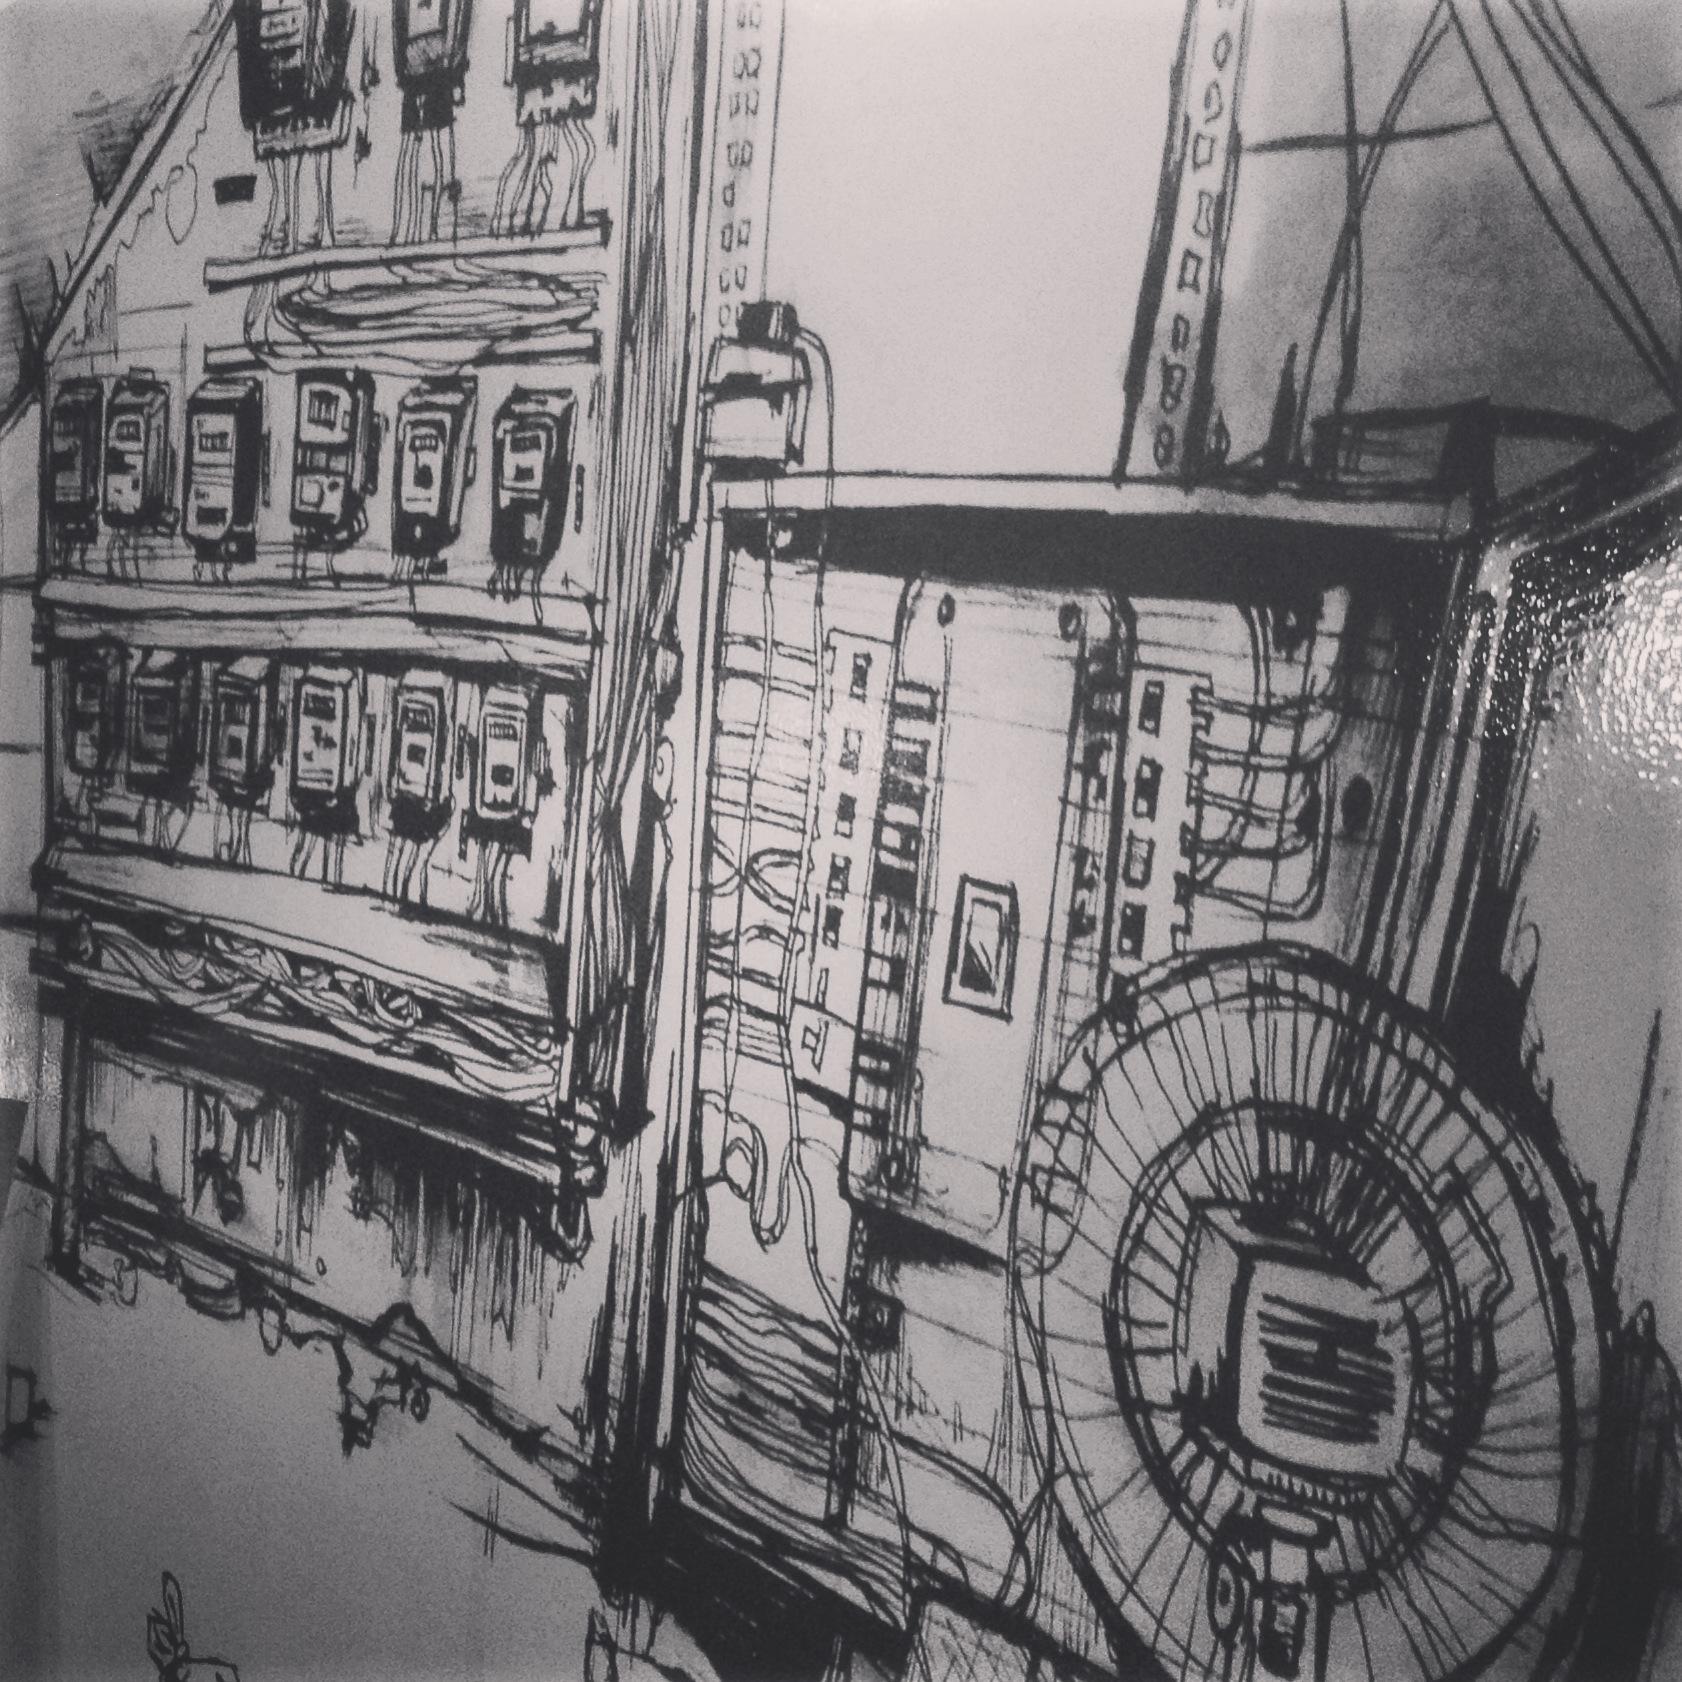 Sketch by Fathima Mohuiddin